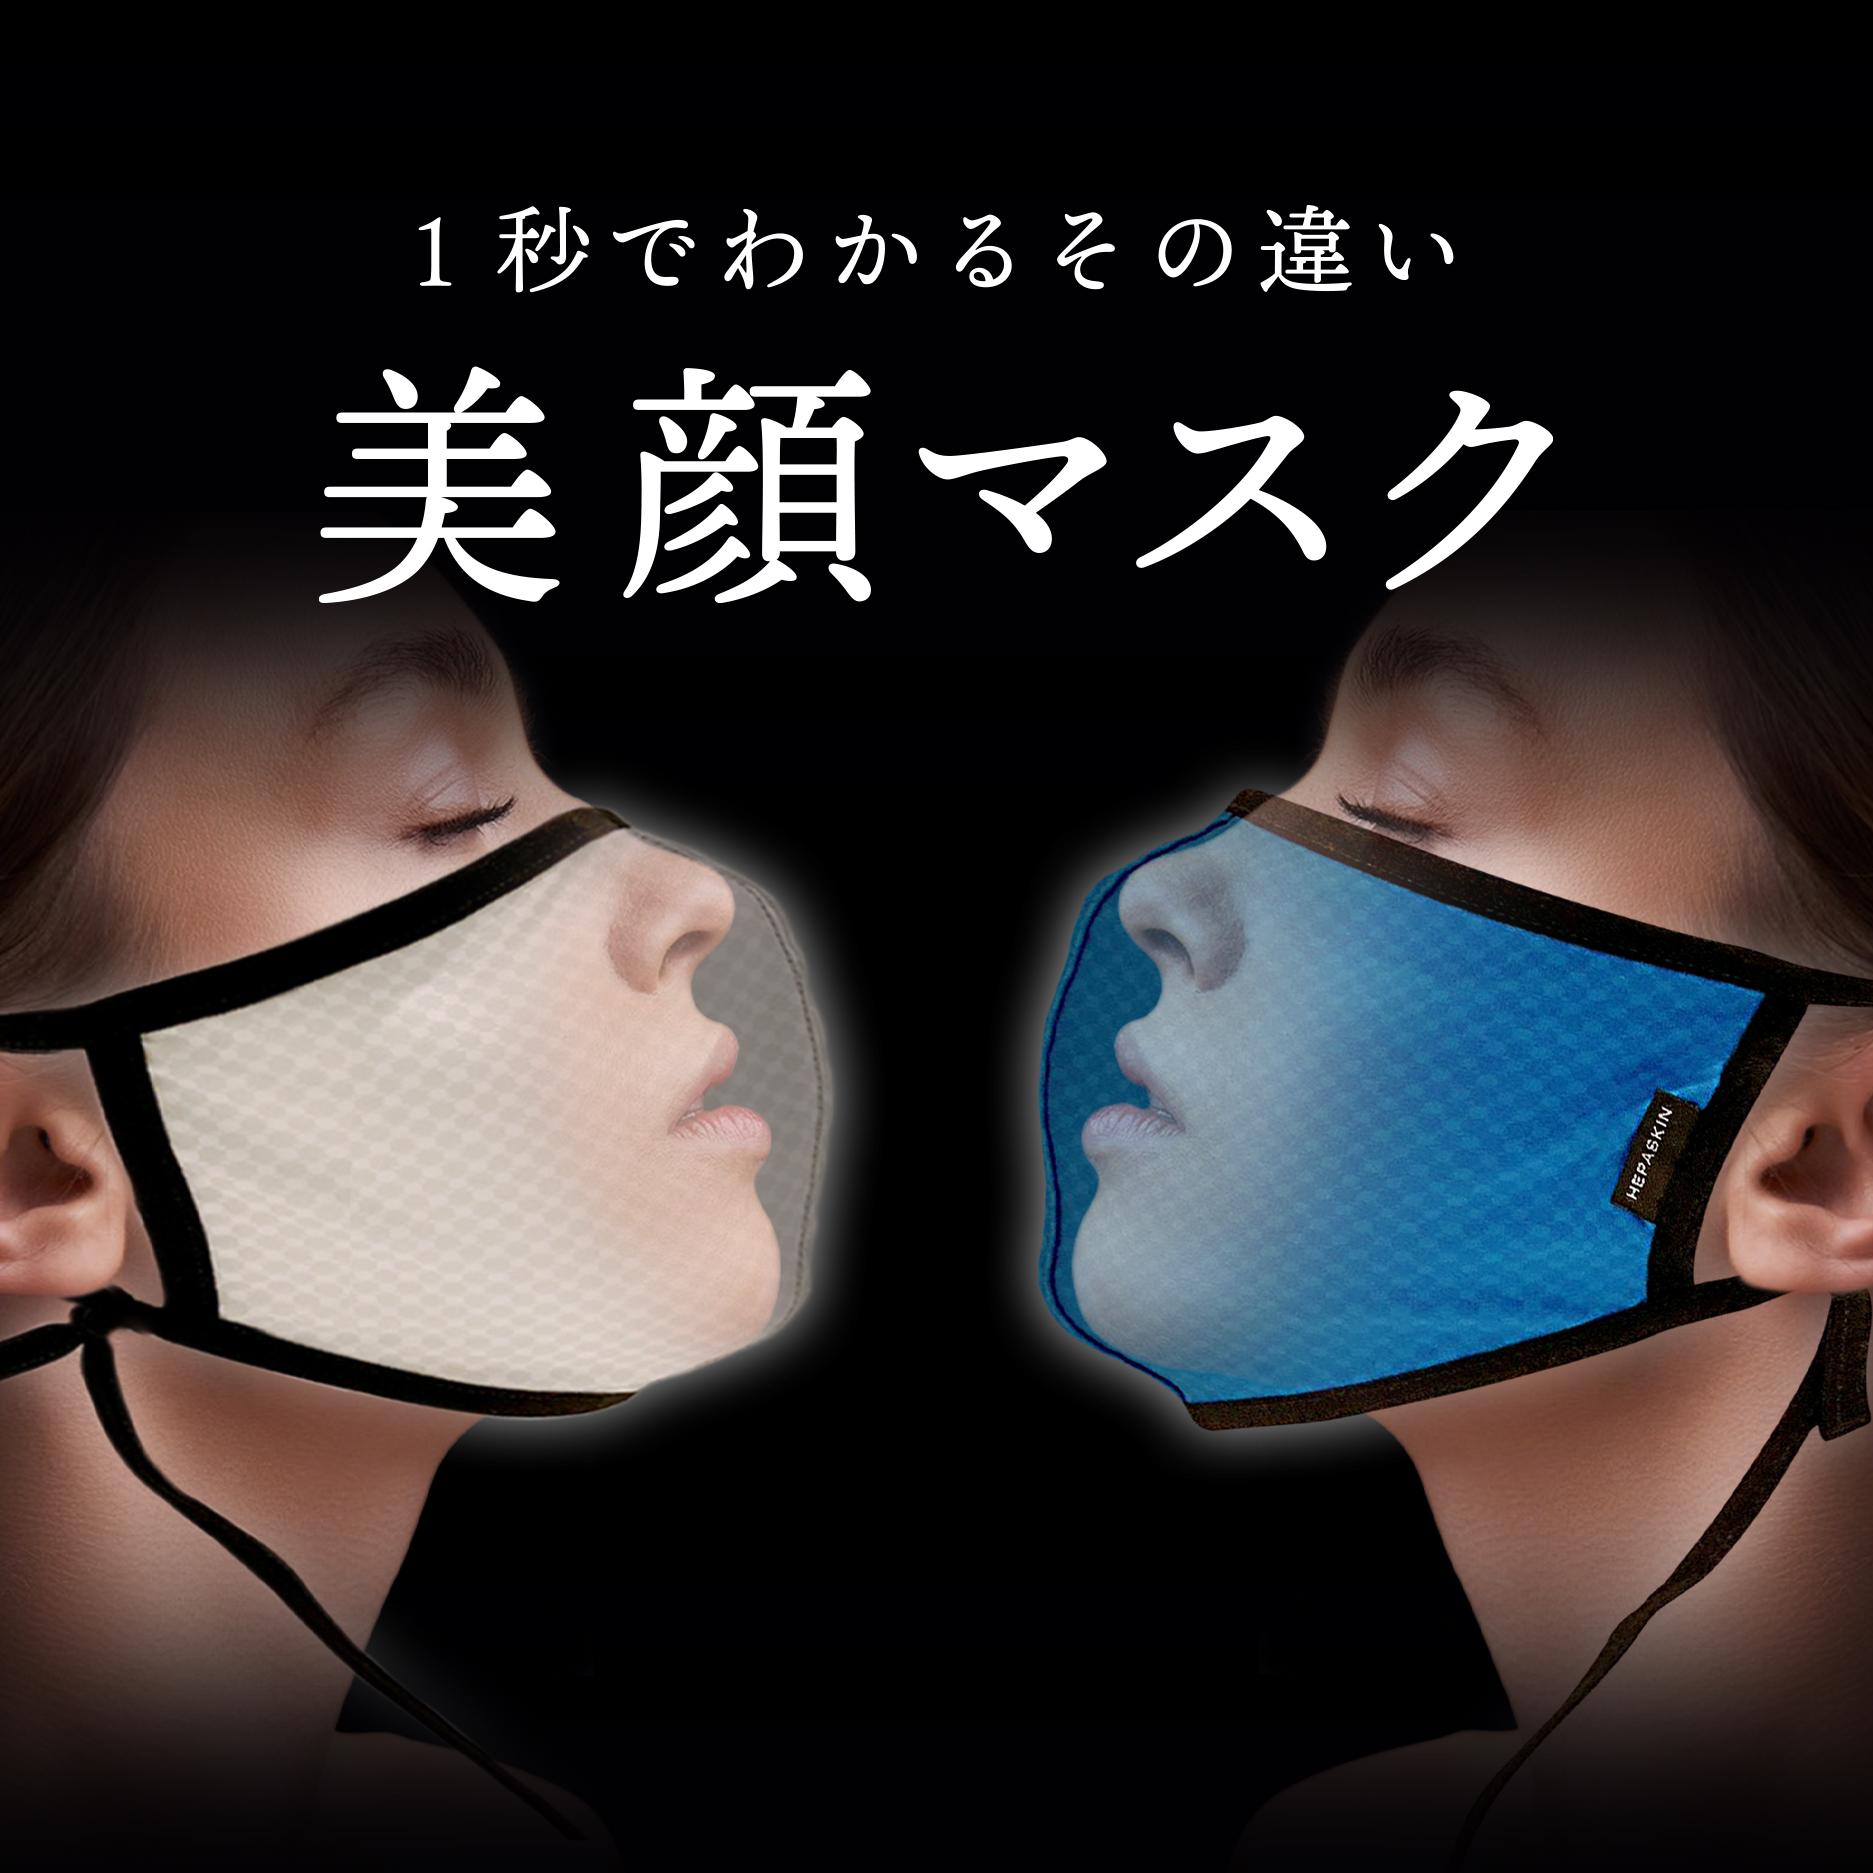 HEPASKIN 4D Stretch Cool Mask ヘパスキン 4D ストレッチクールマスク